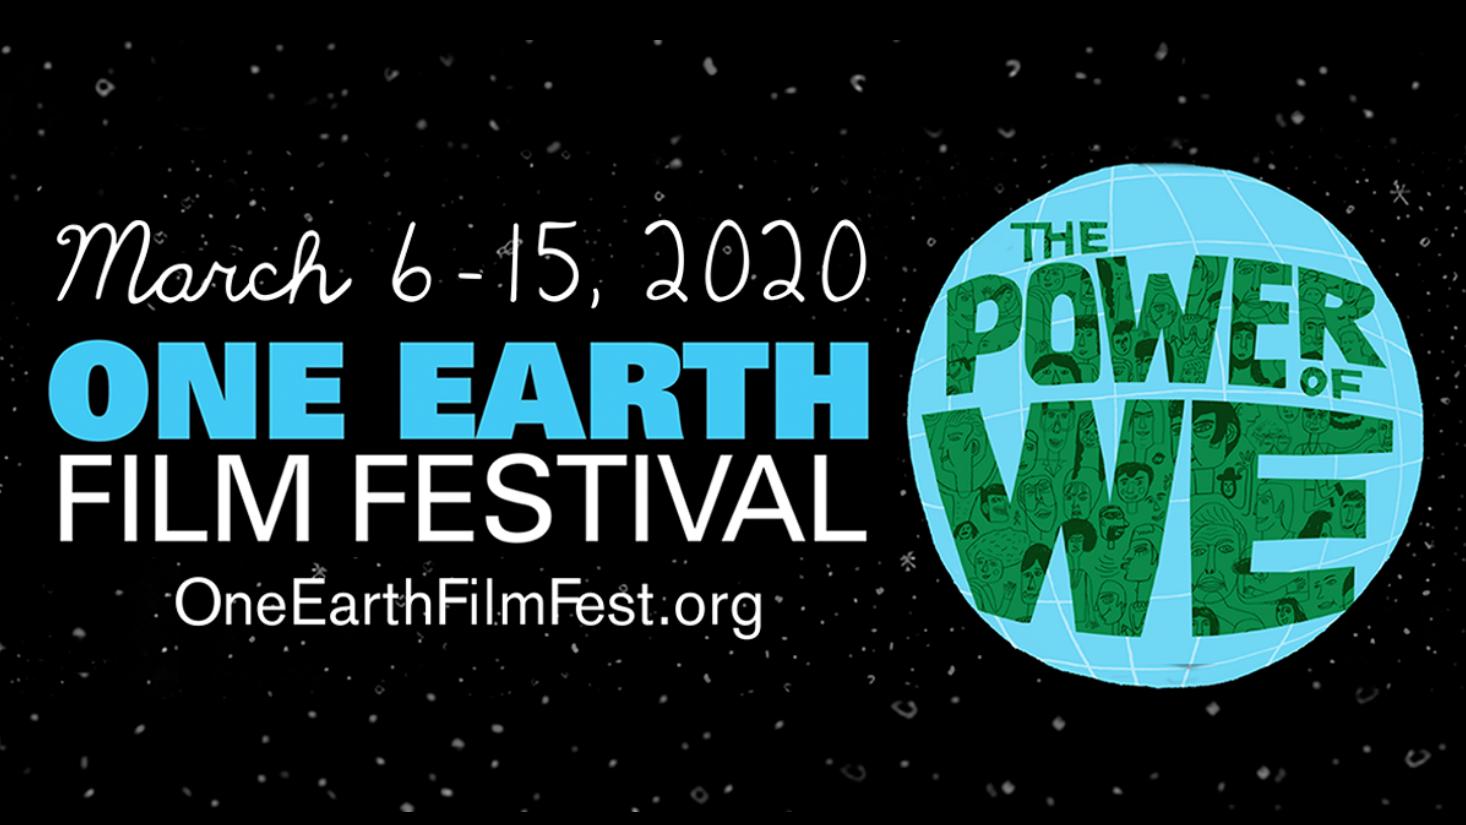 Courtesy of One Earth Film Festival